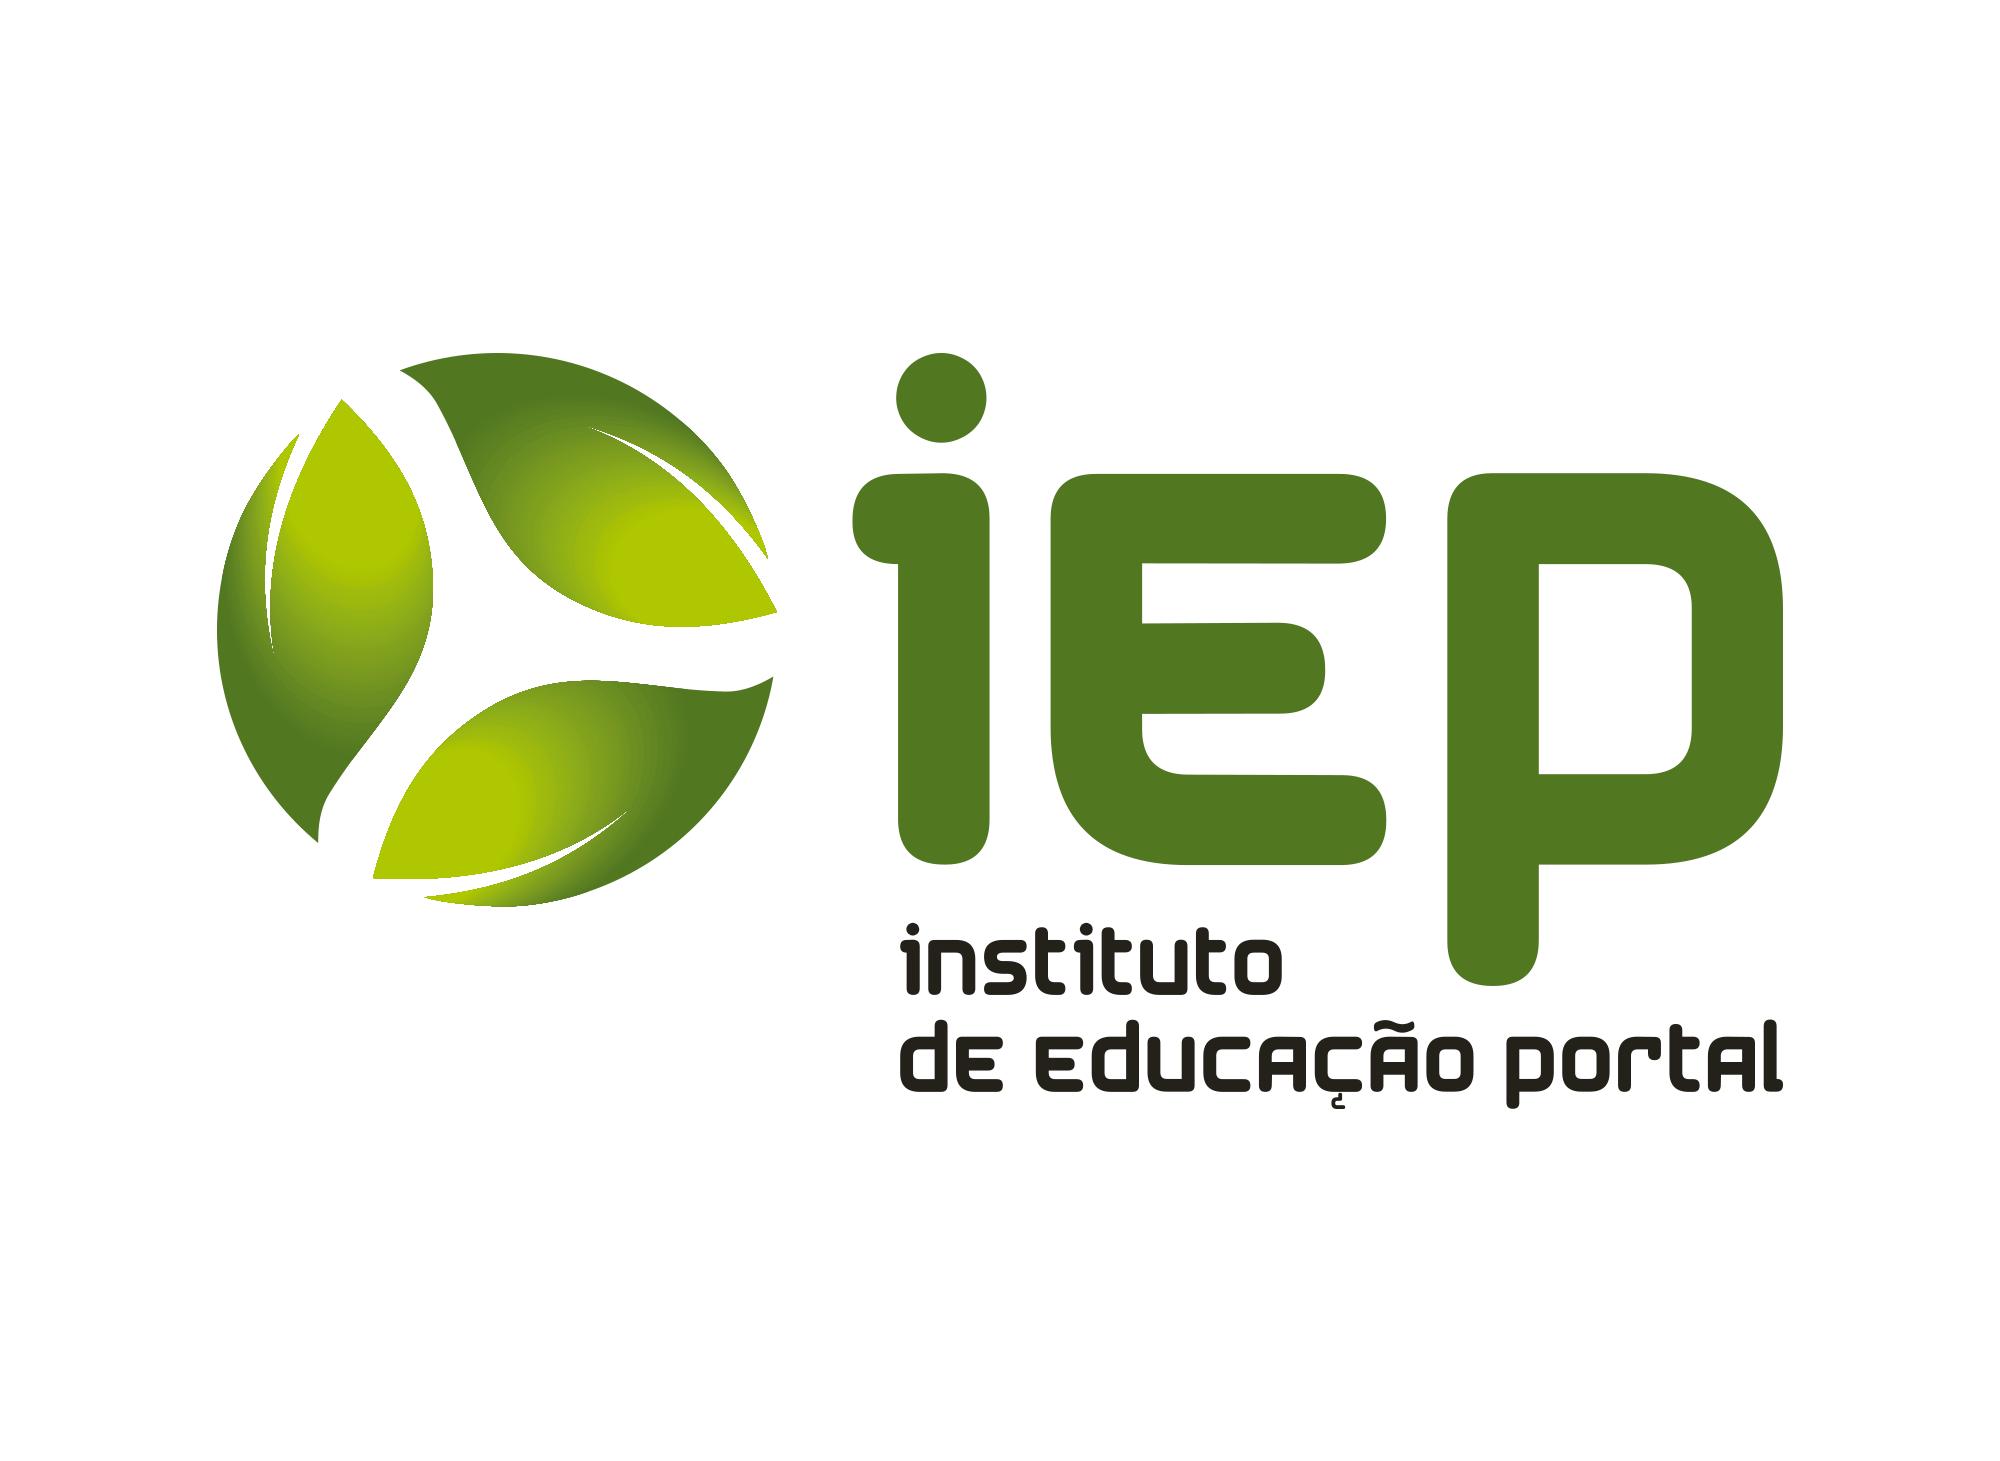 instituto-educacao-portal-iep-clientes-atendidos-agencia-diretriz-digital-marketing-fortaleza